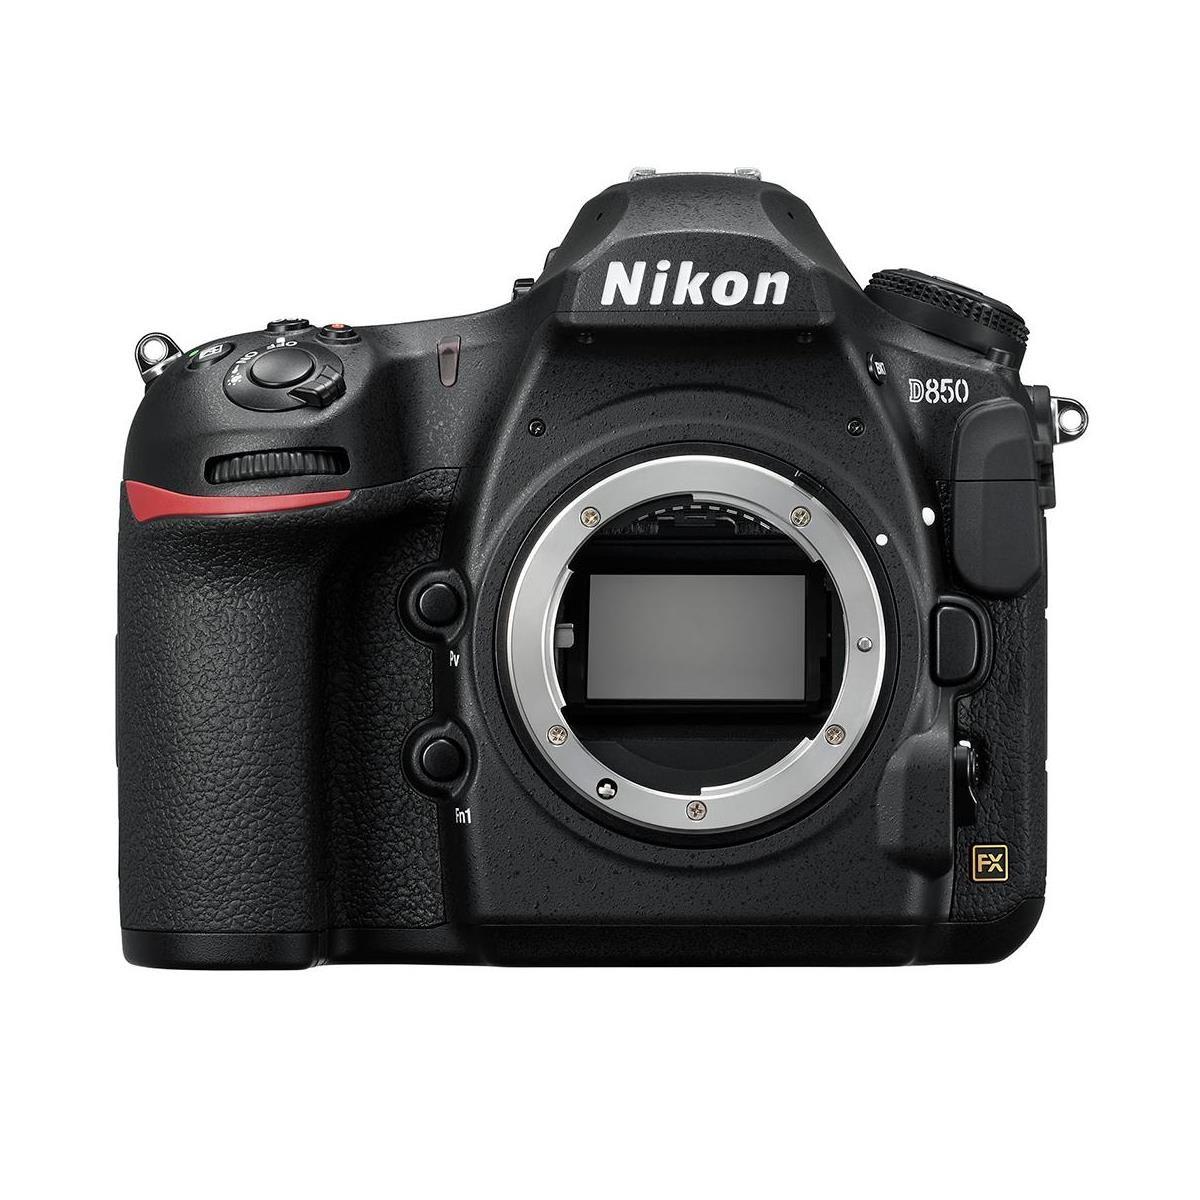 Black Friday Camera Deals In 2020 Cameras Lenses Lighting And More Digital Camera World